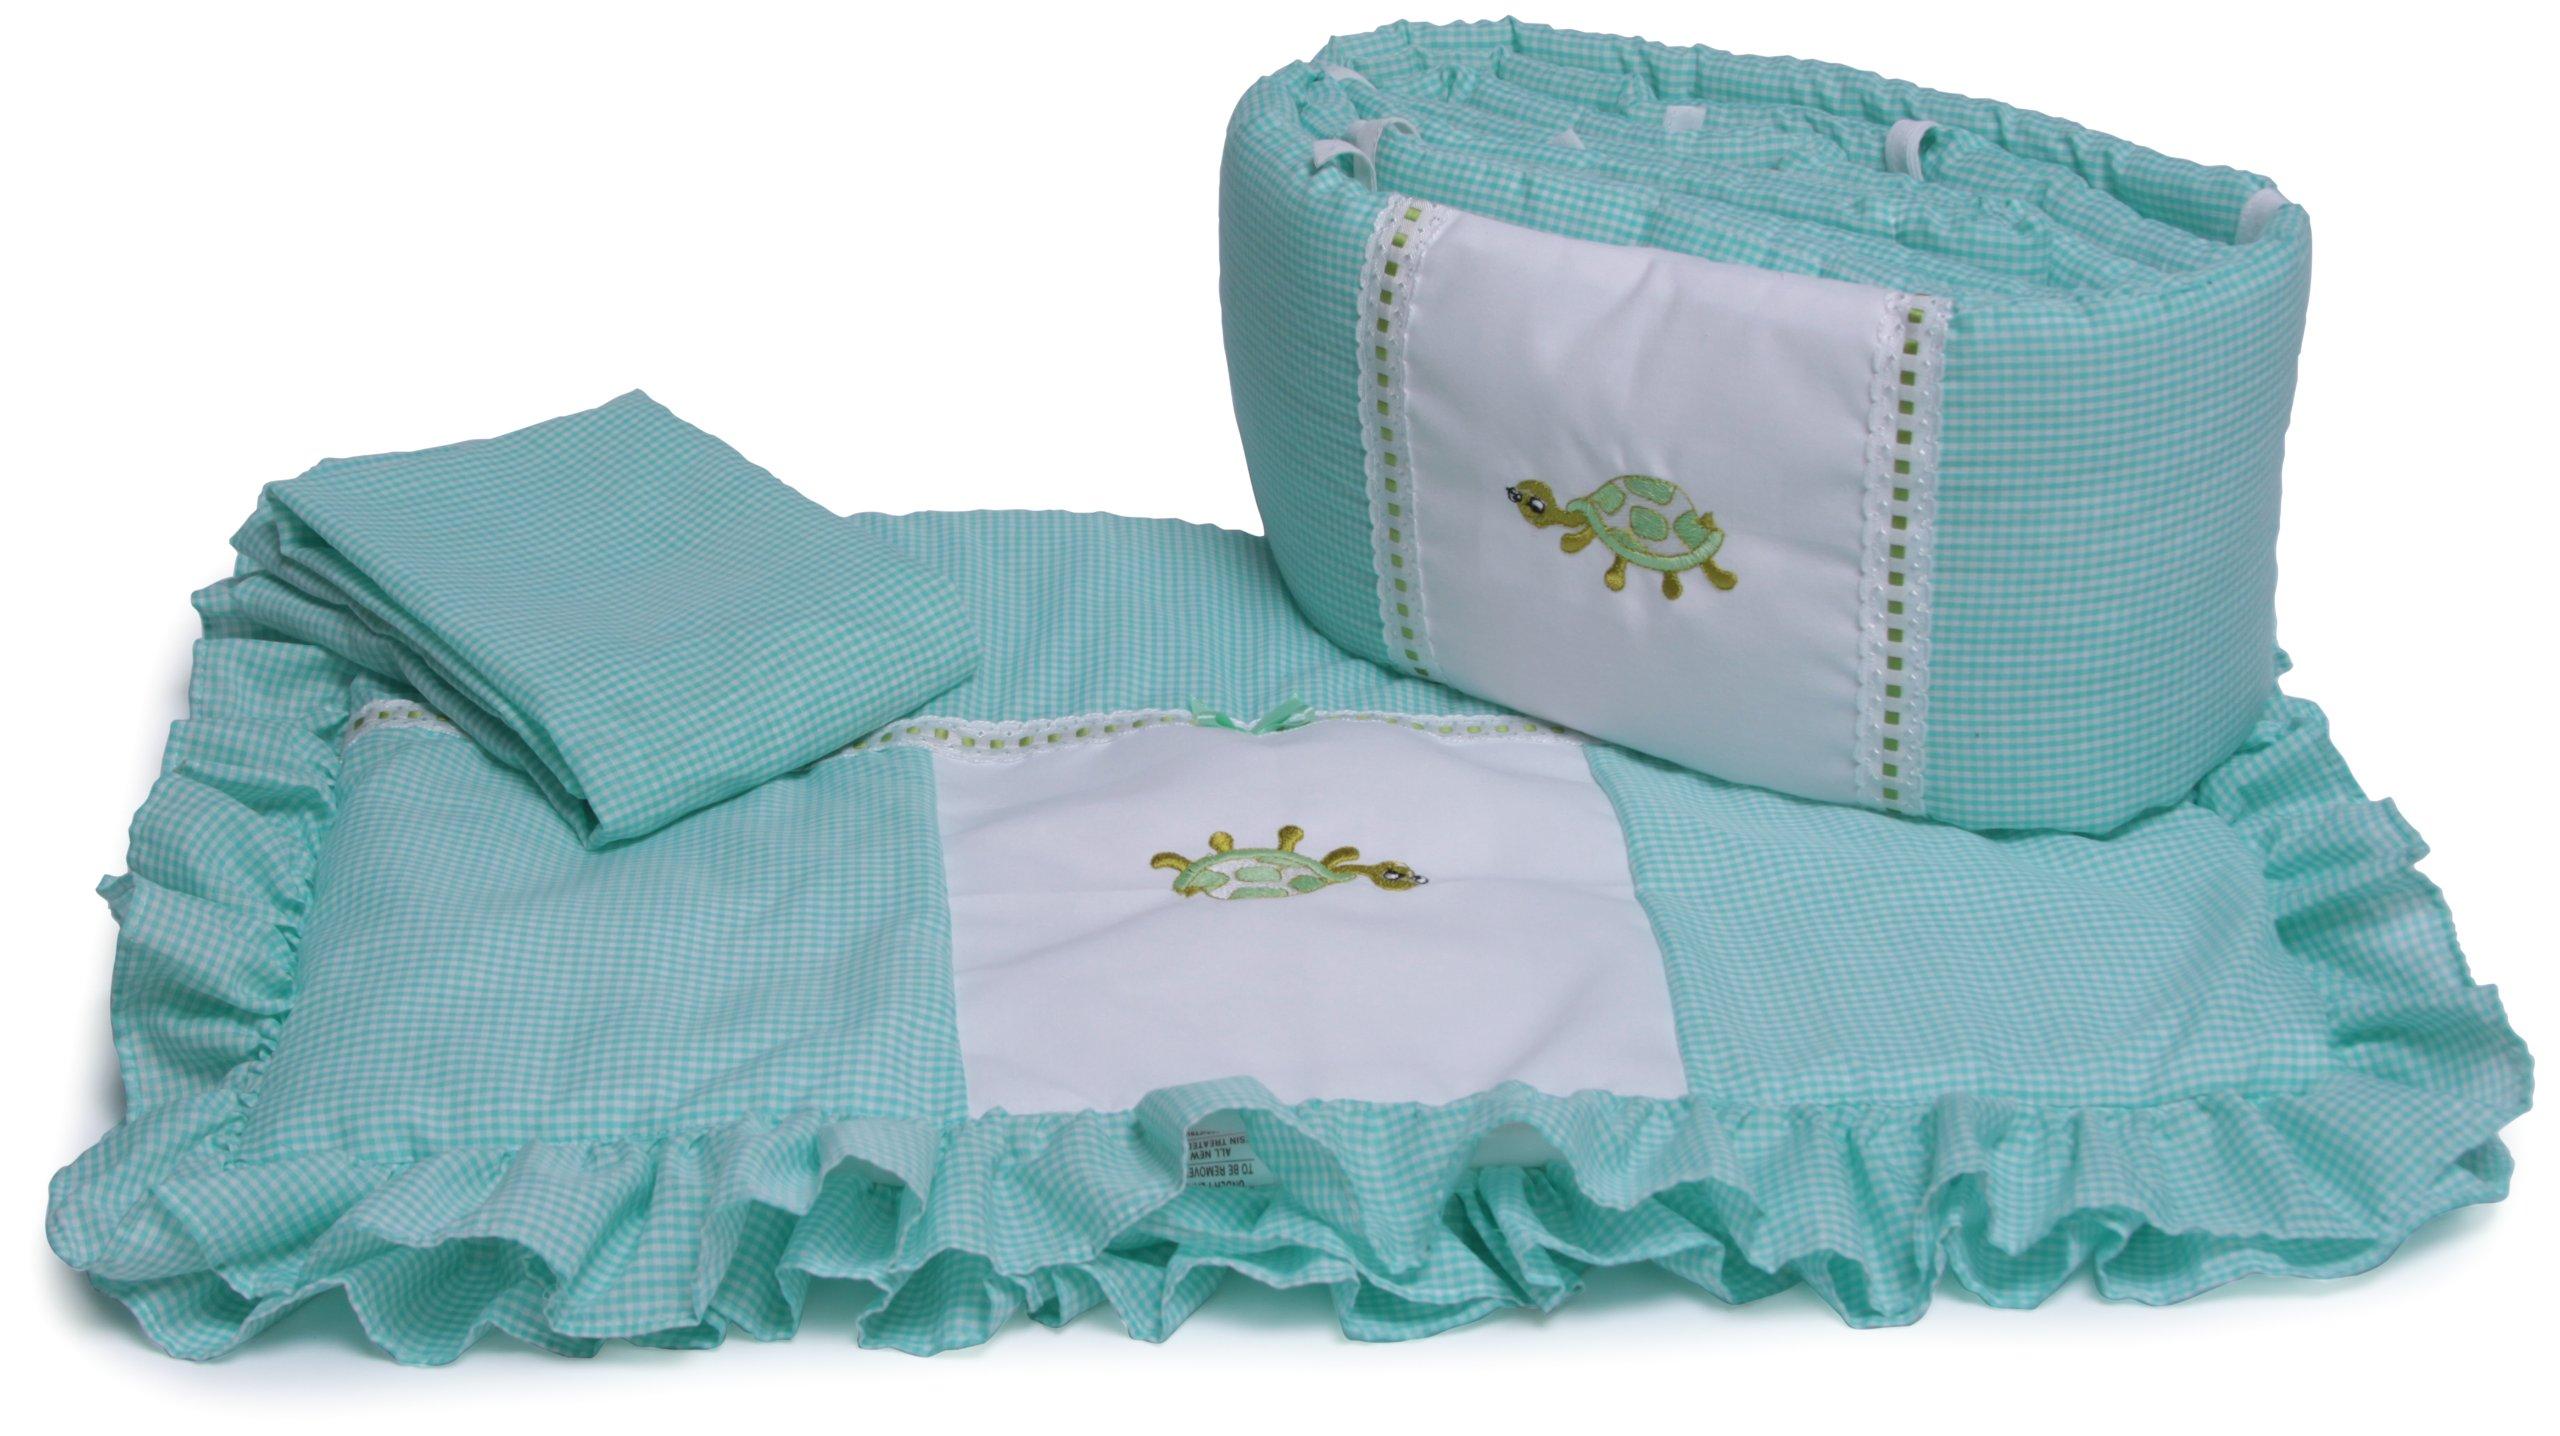 Baby Doll Bedding Gingham Applique Cradle Bedding Set, Turtle